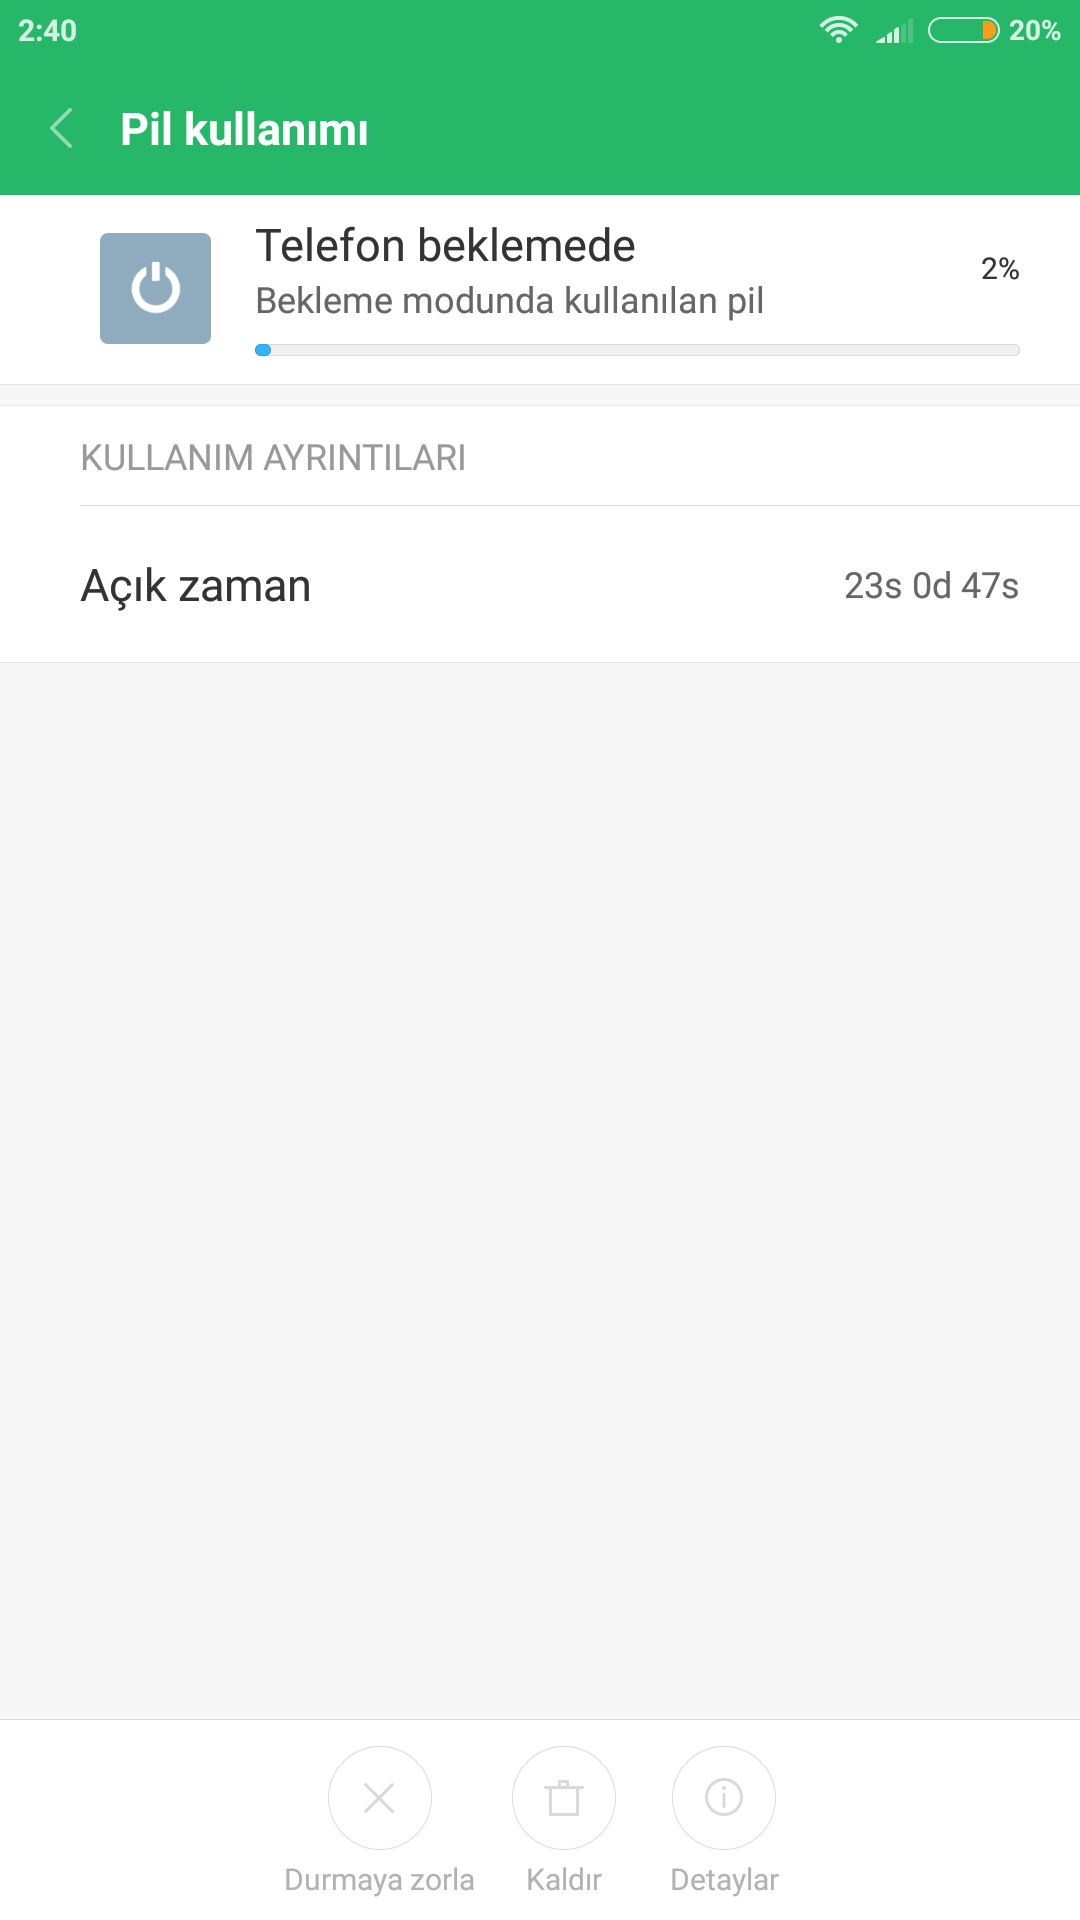 ☆ Xiaomi Redmi Note 4X & Redmi Note 4 Global ☆Qual m Versiyon☆ Ana Konu & Kullanıcı Kulübü Sayfa 281 414